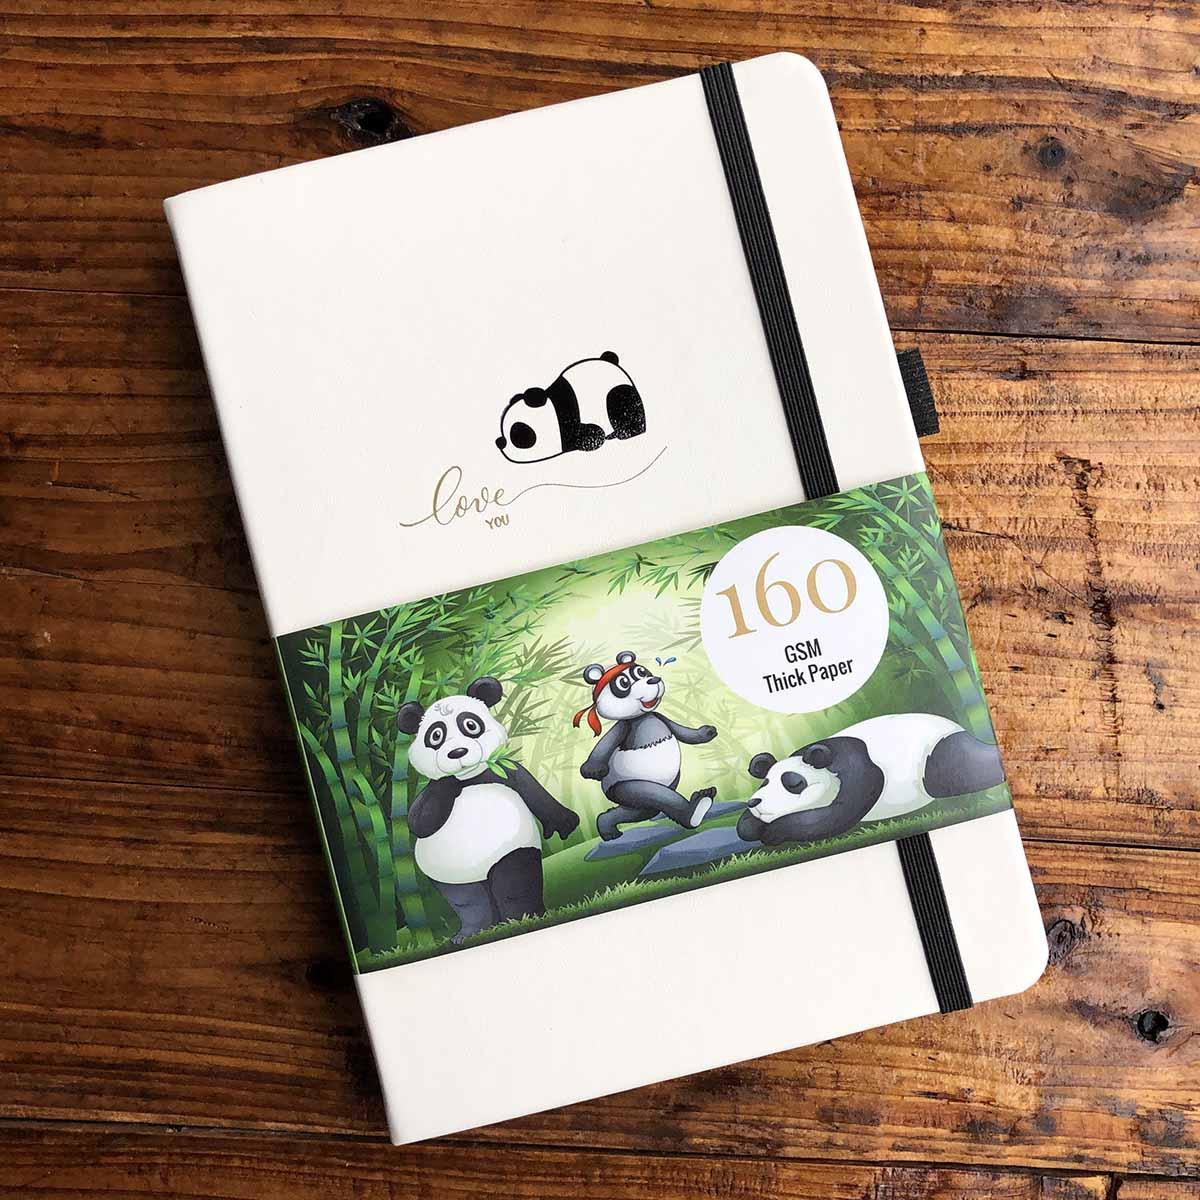 Panda LOGO Notebooks Journals Dotted 160GSM Paper 5*5 Mm DOTS